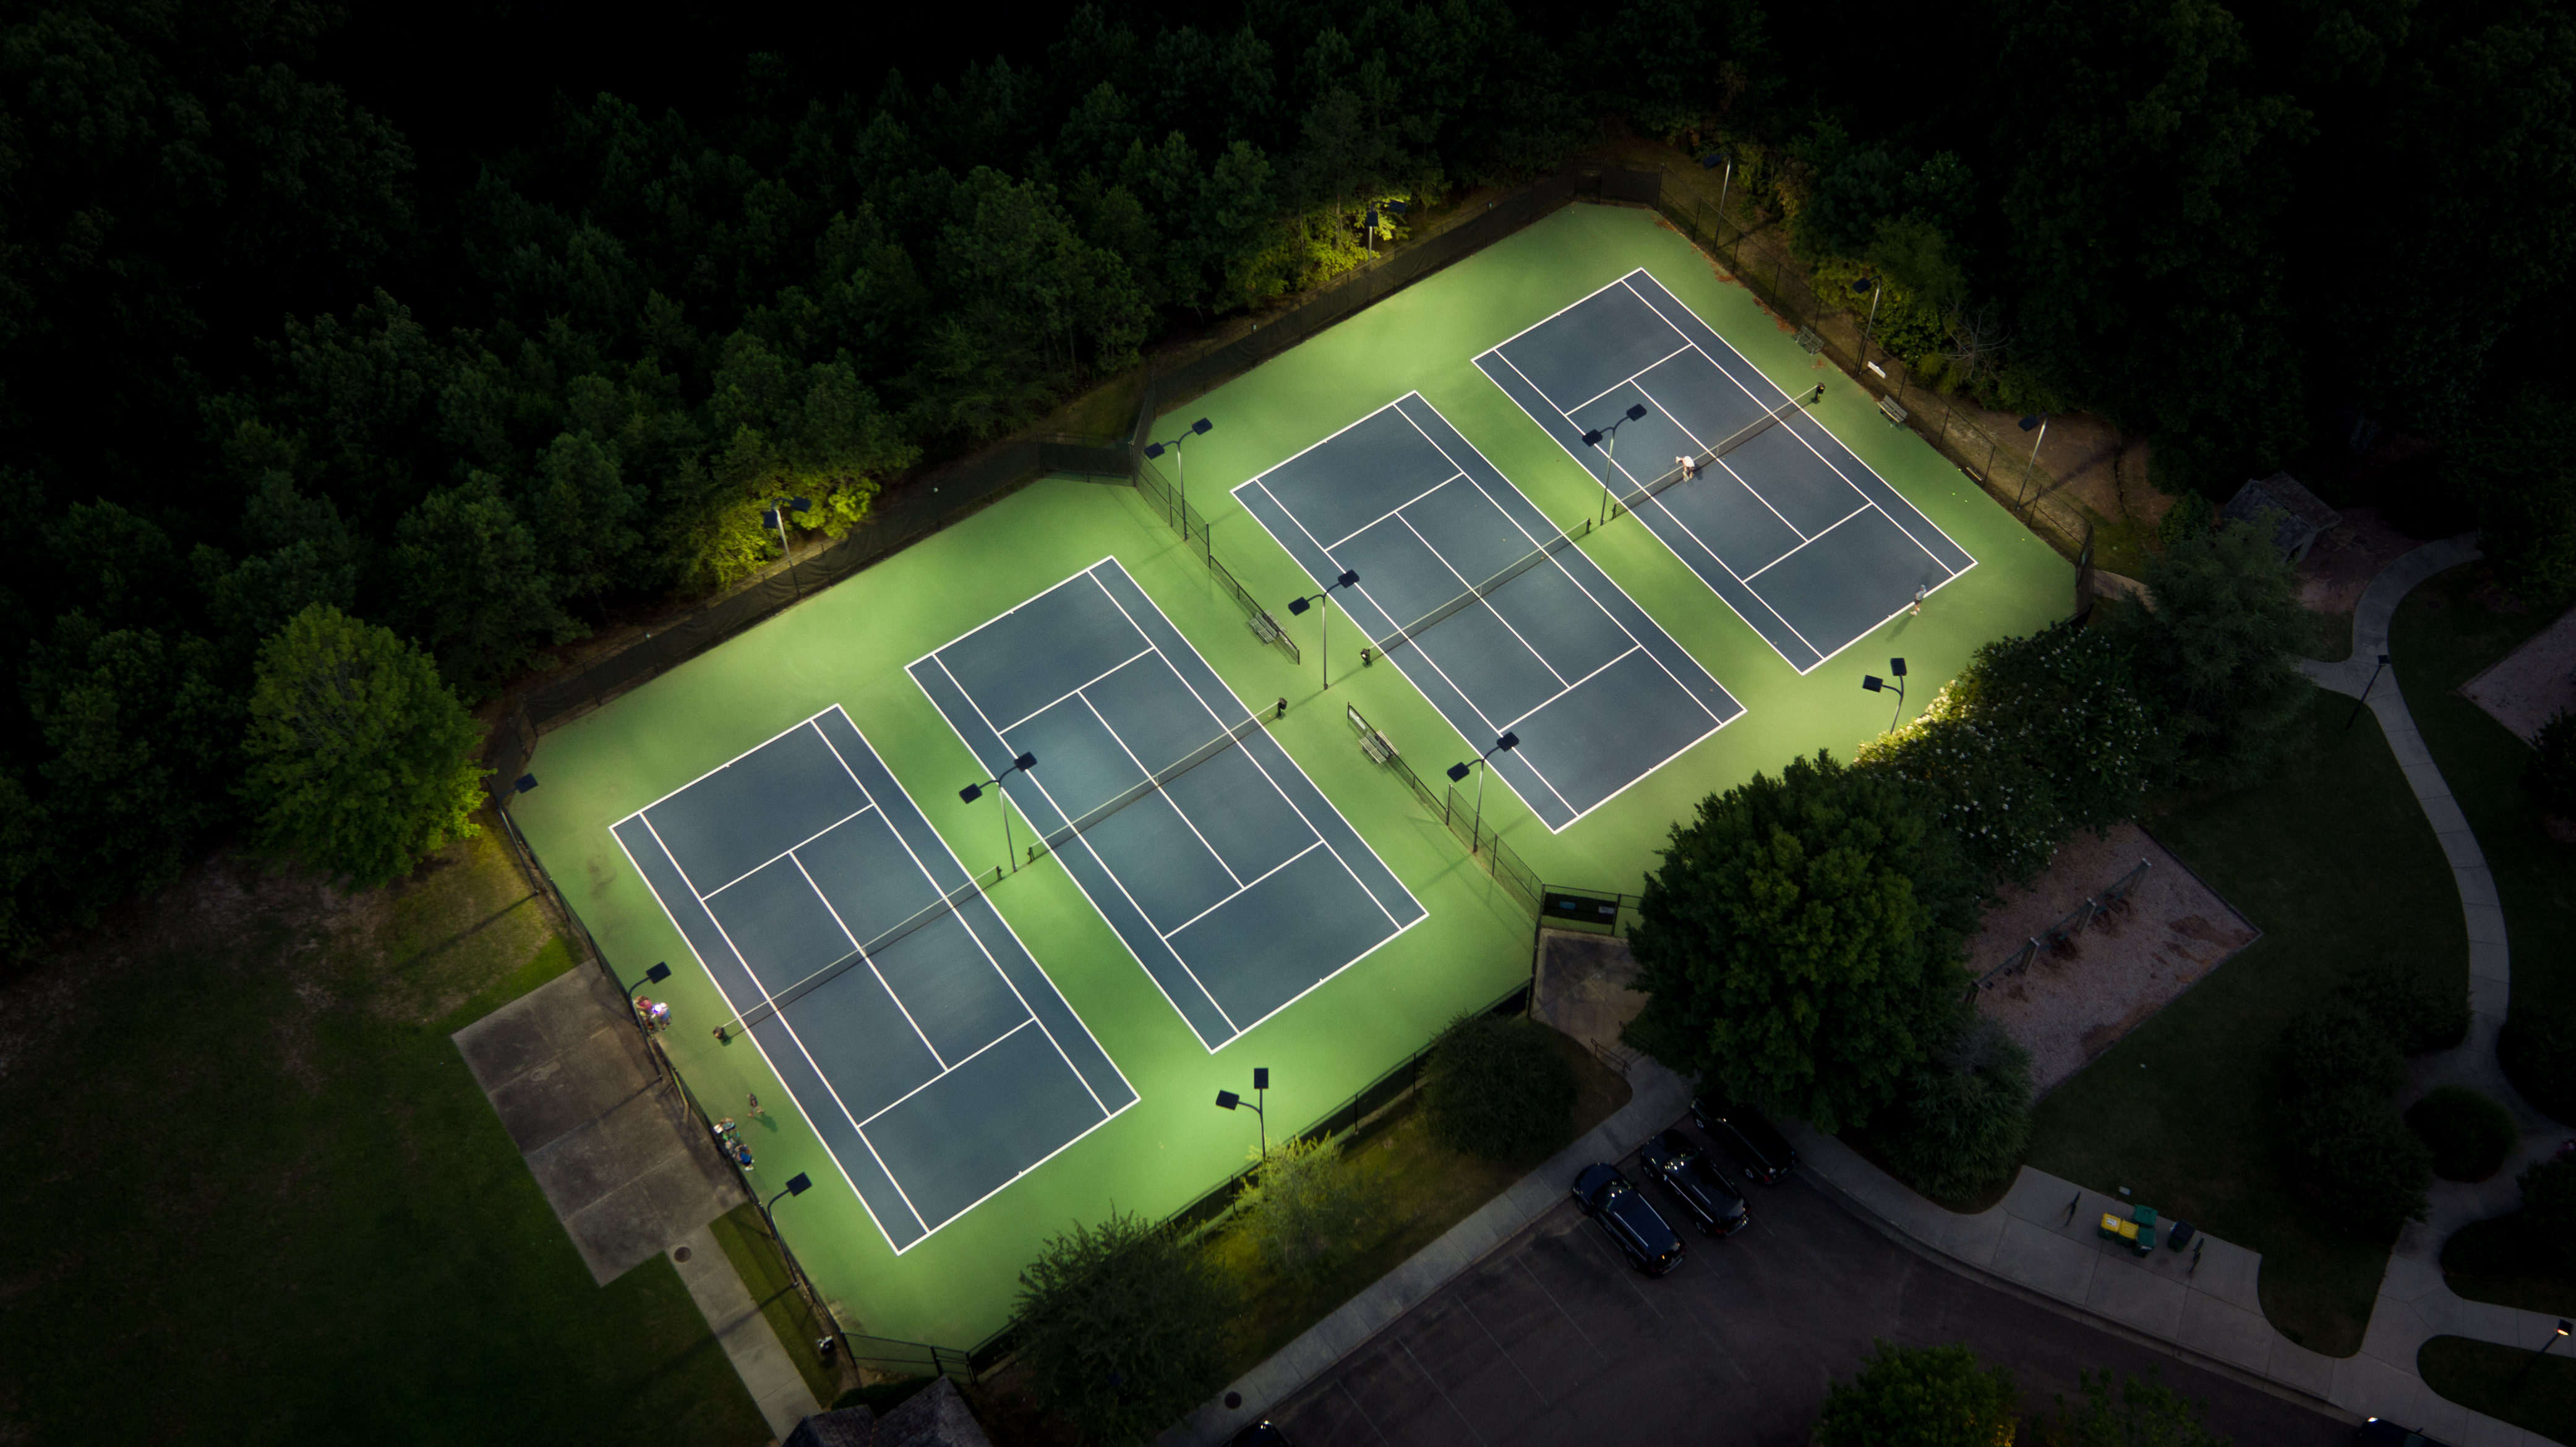 GS.Tennis.Aerial.Night.jpg